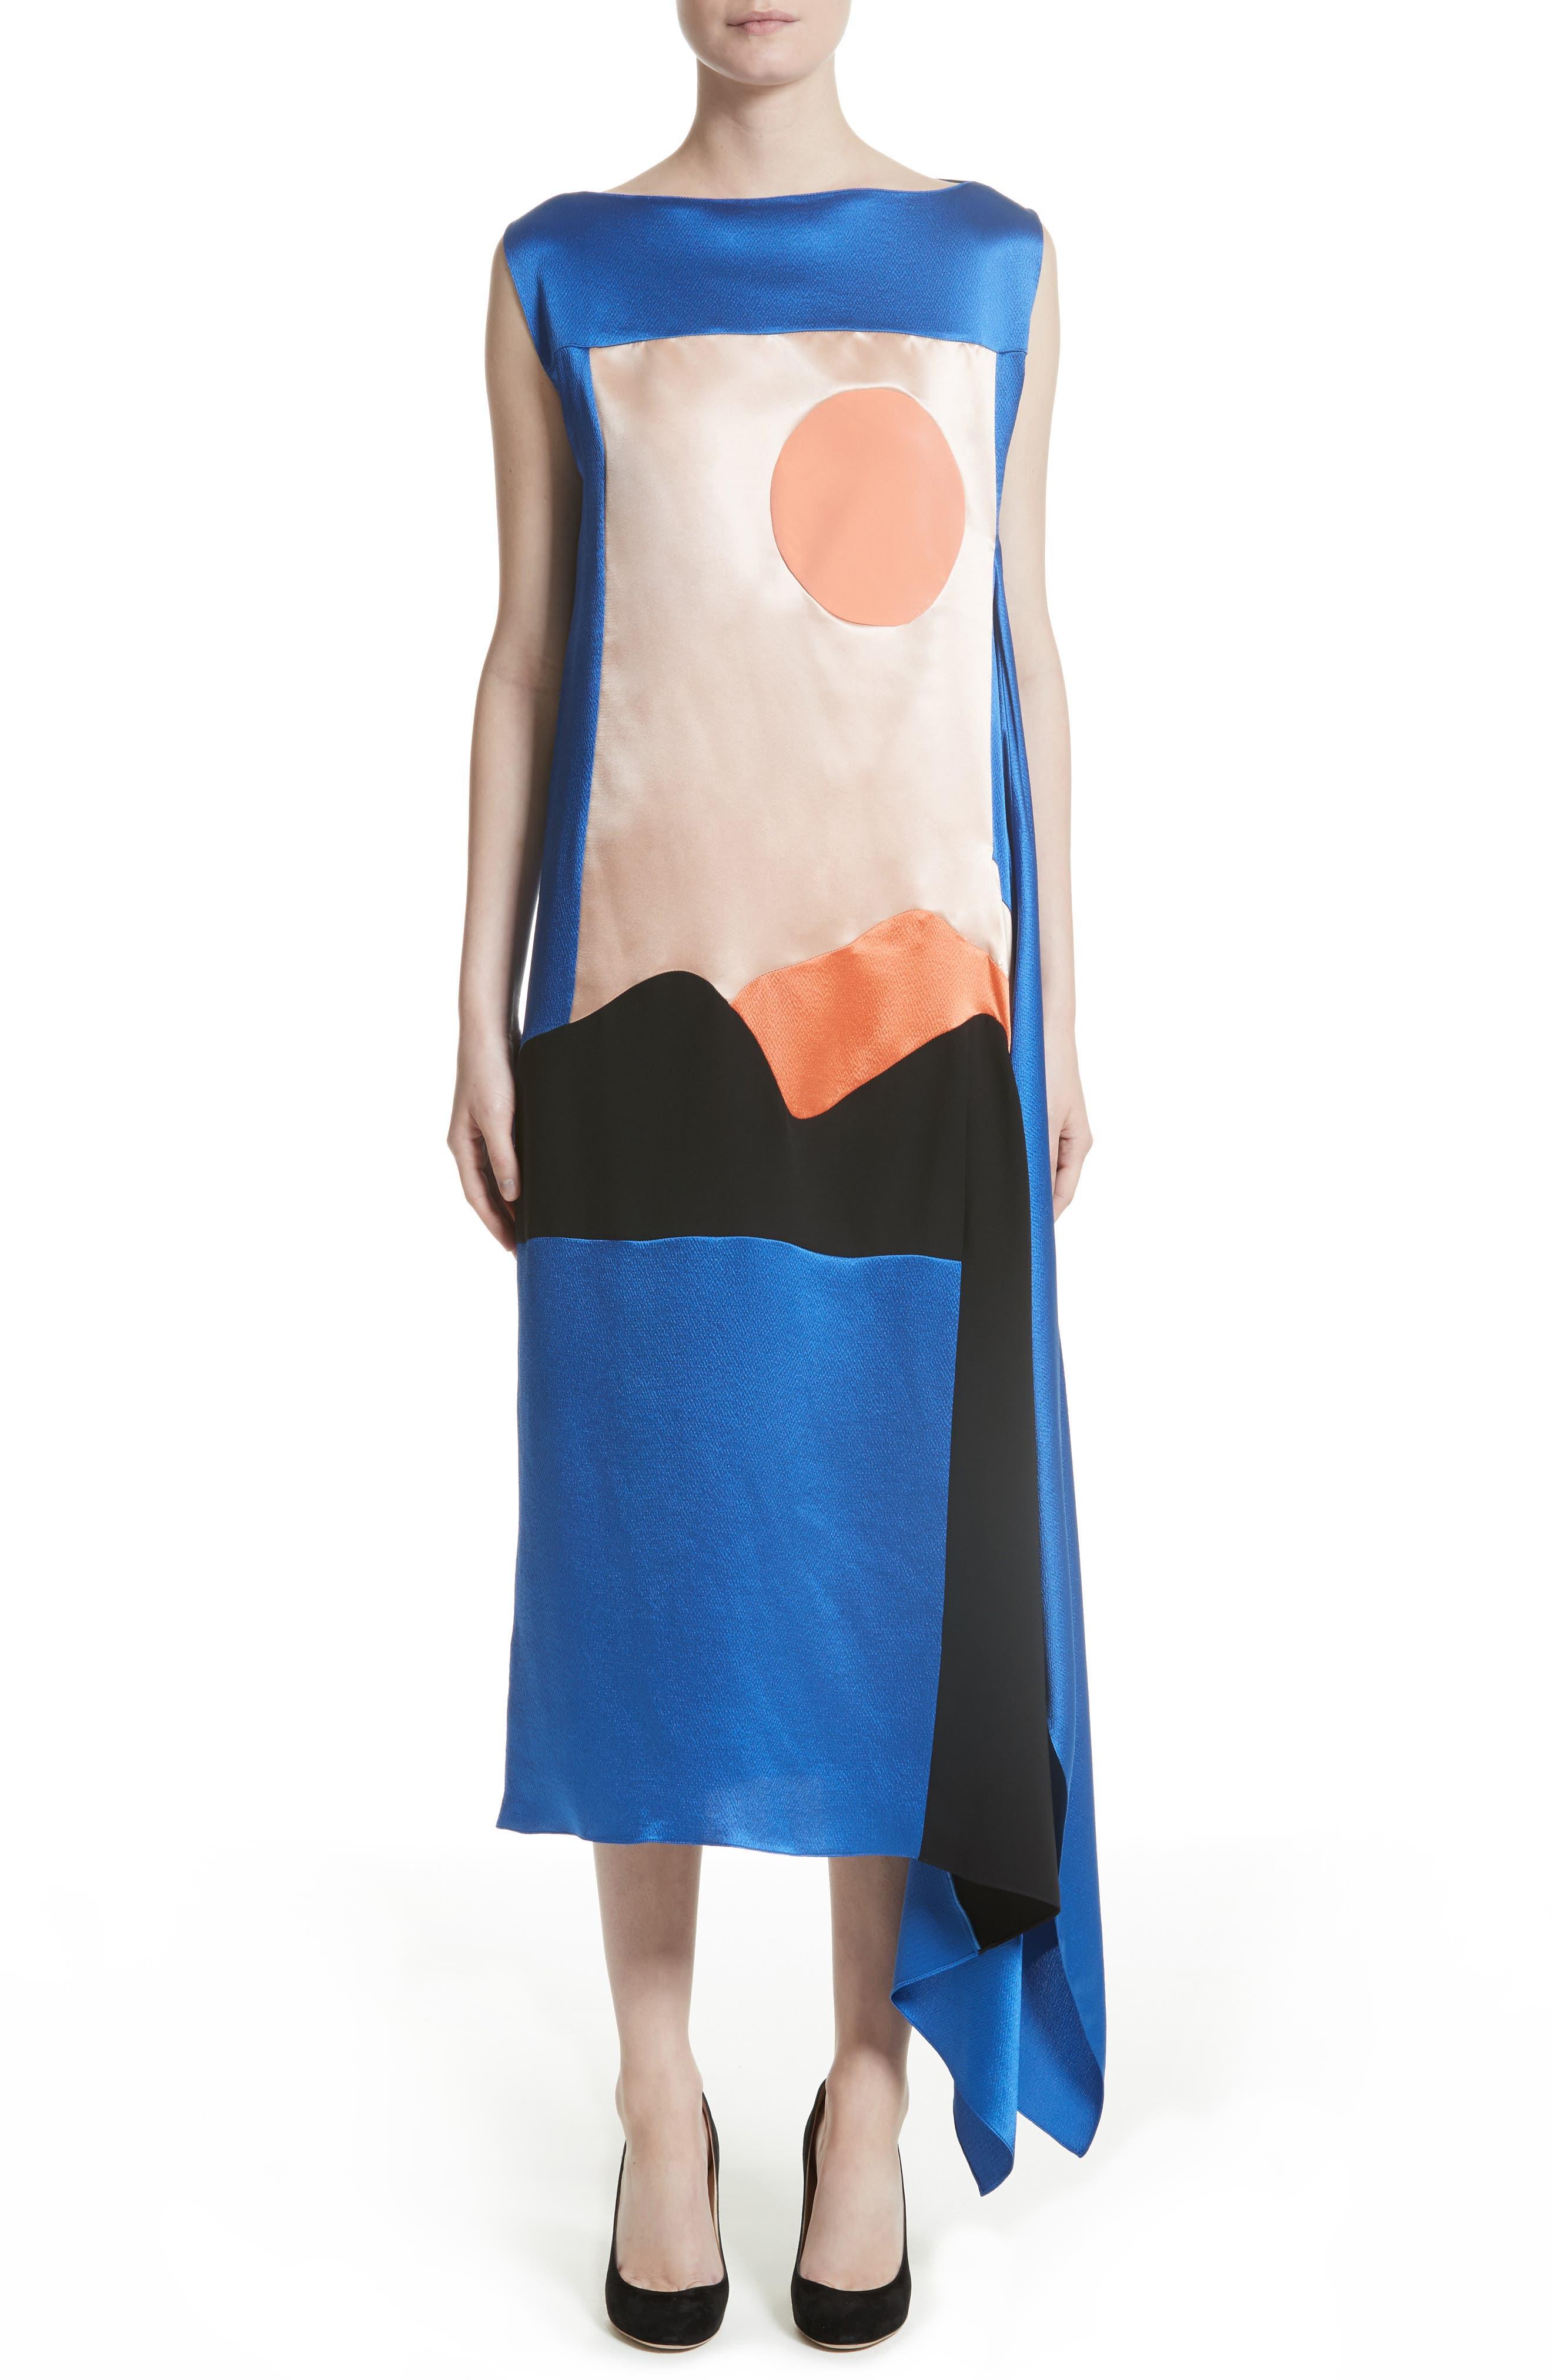 Nakato Hammered Silk, Satin and Crêpe de Chine Midi Dress,                         Main,                         color, Blue/ Black/ Blush/ Apricot